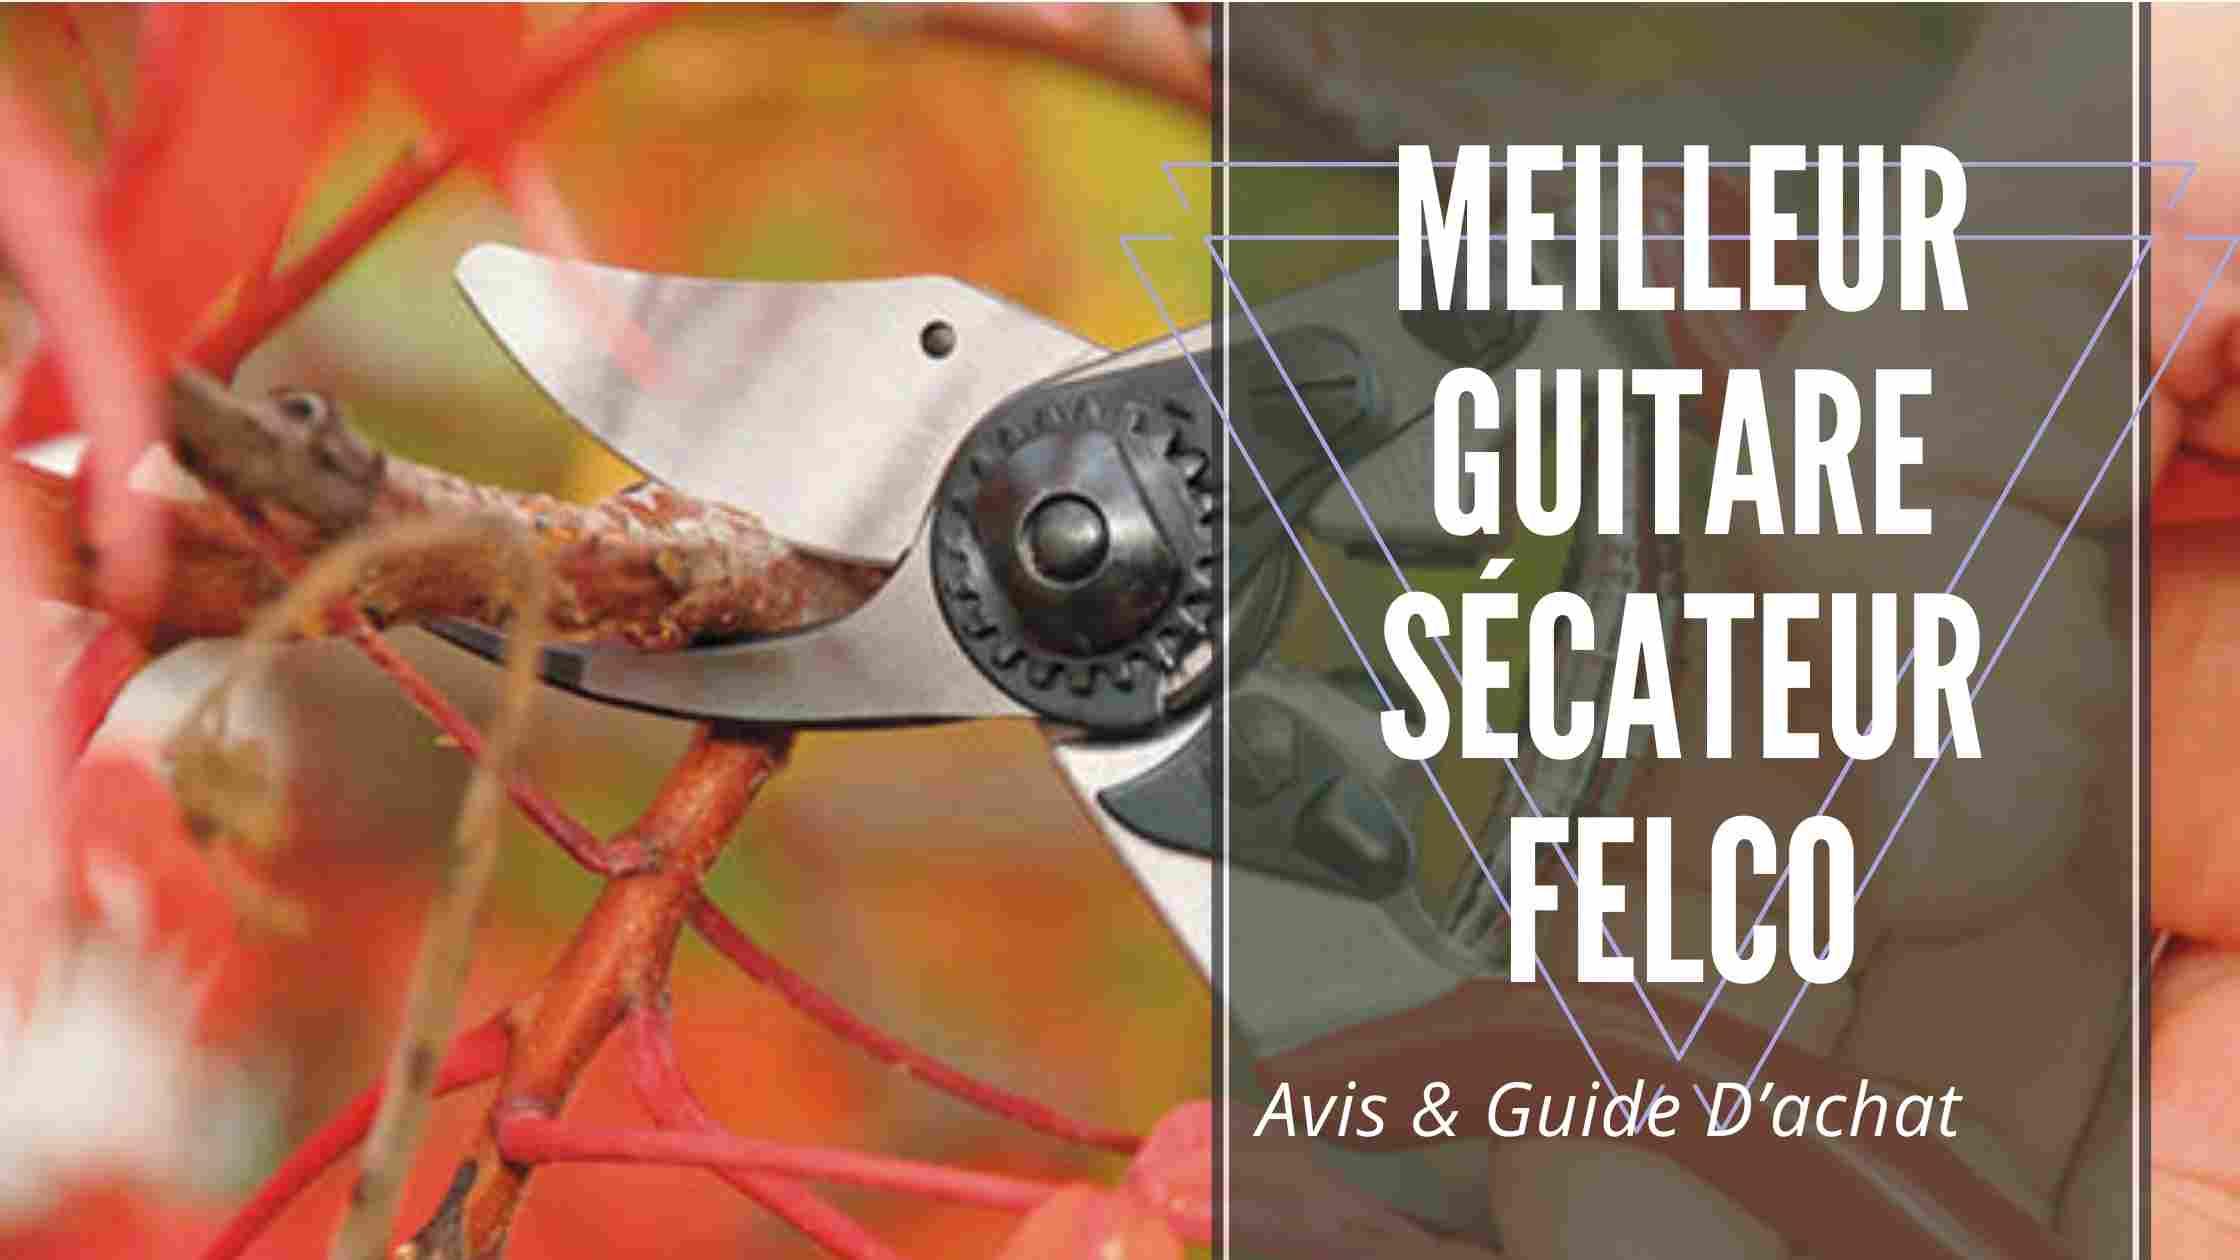 Meilleur Guitare Sécateur Felco